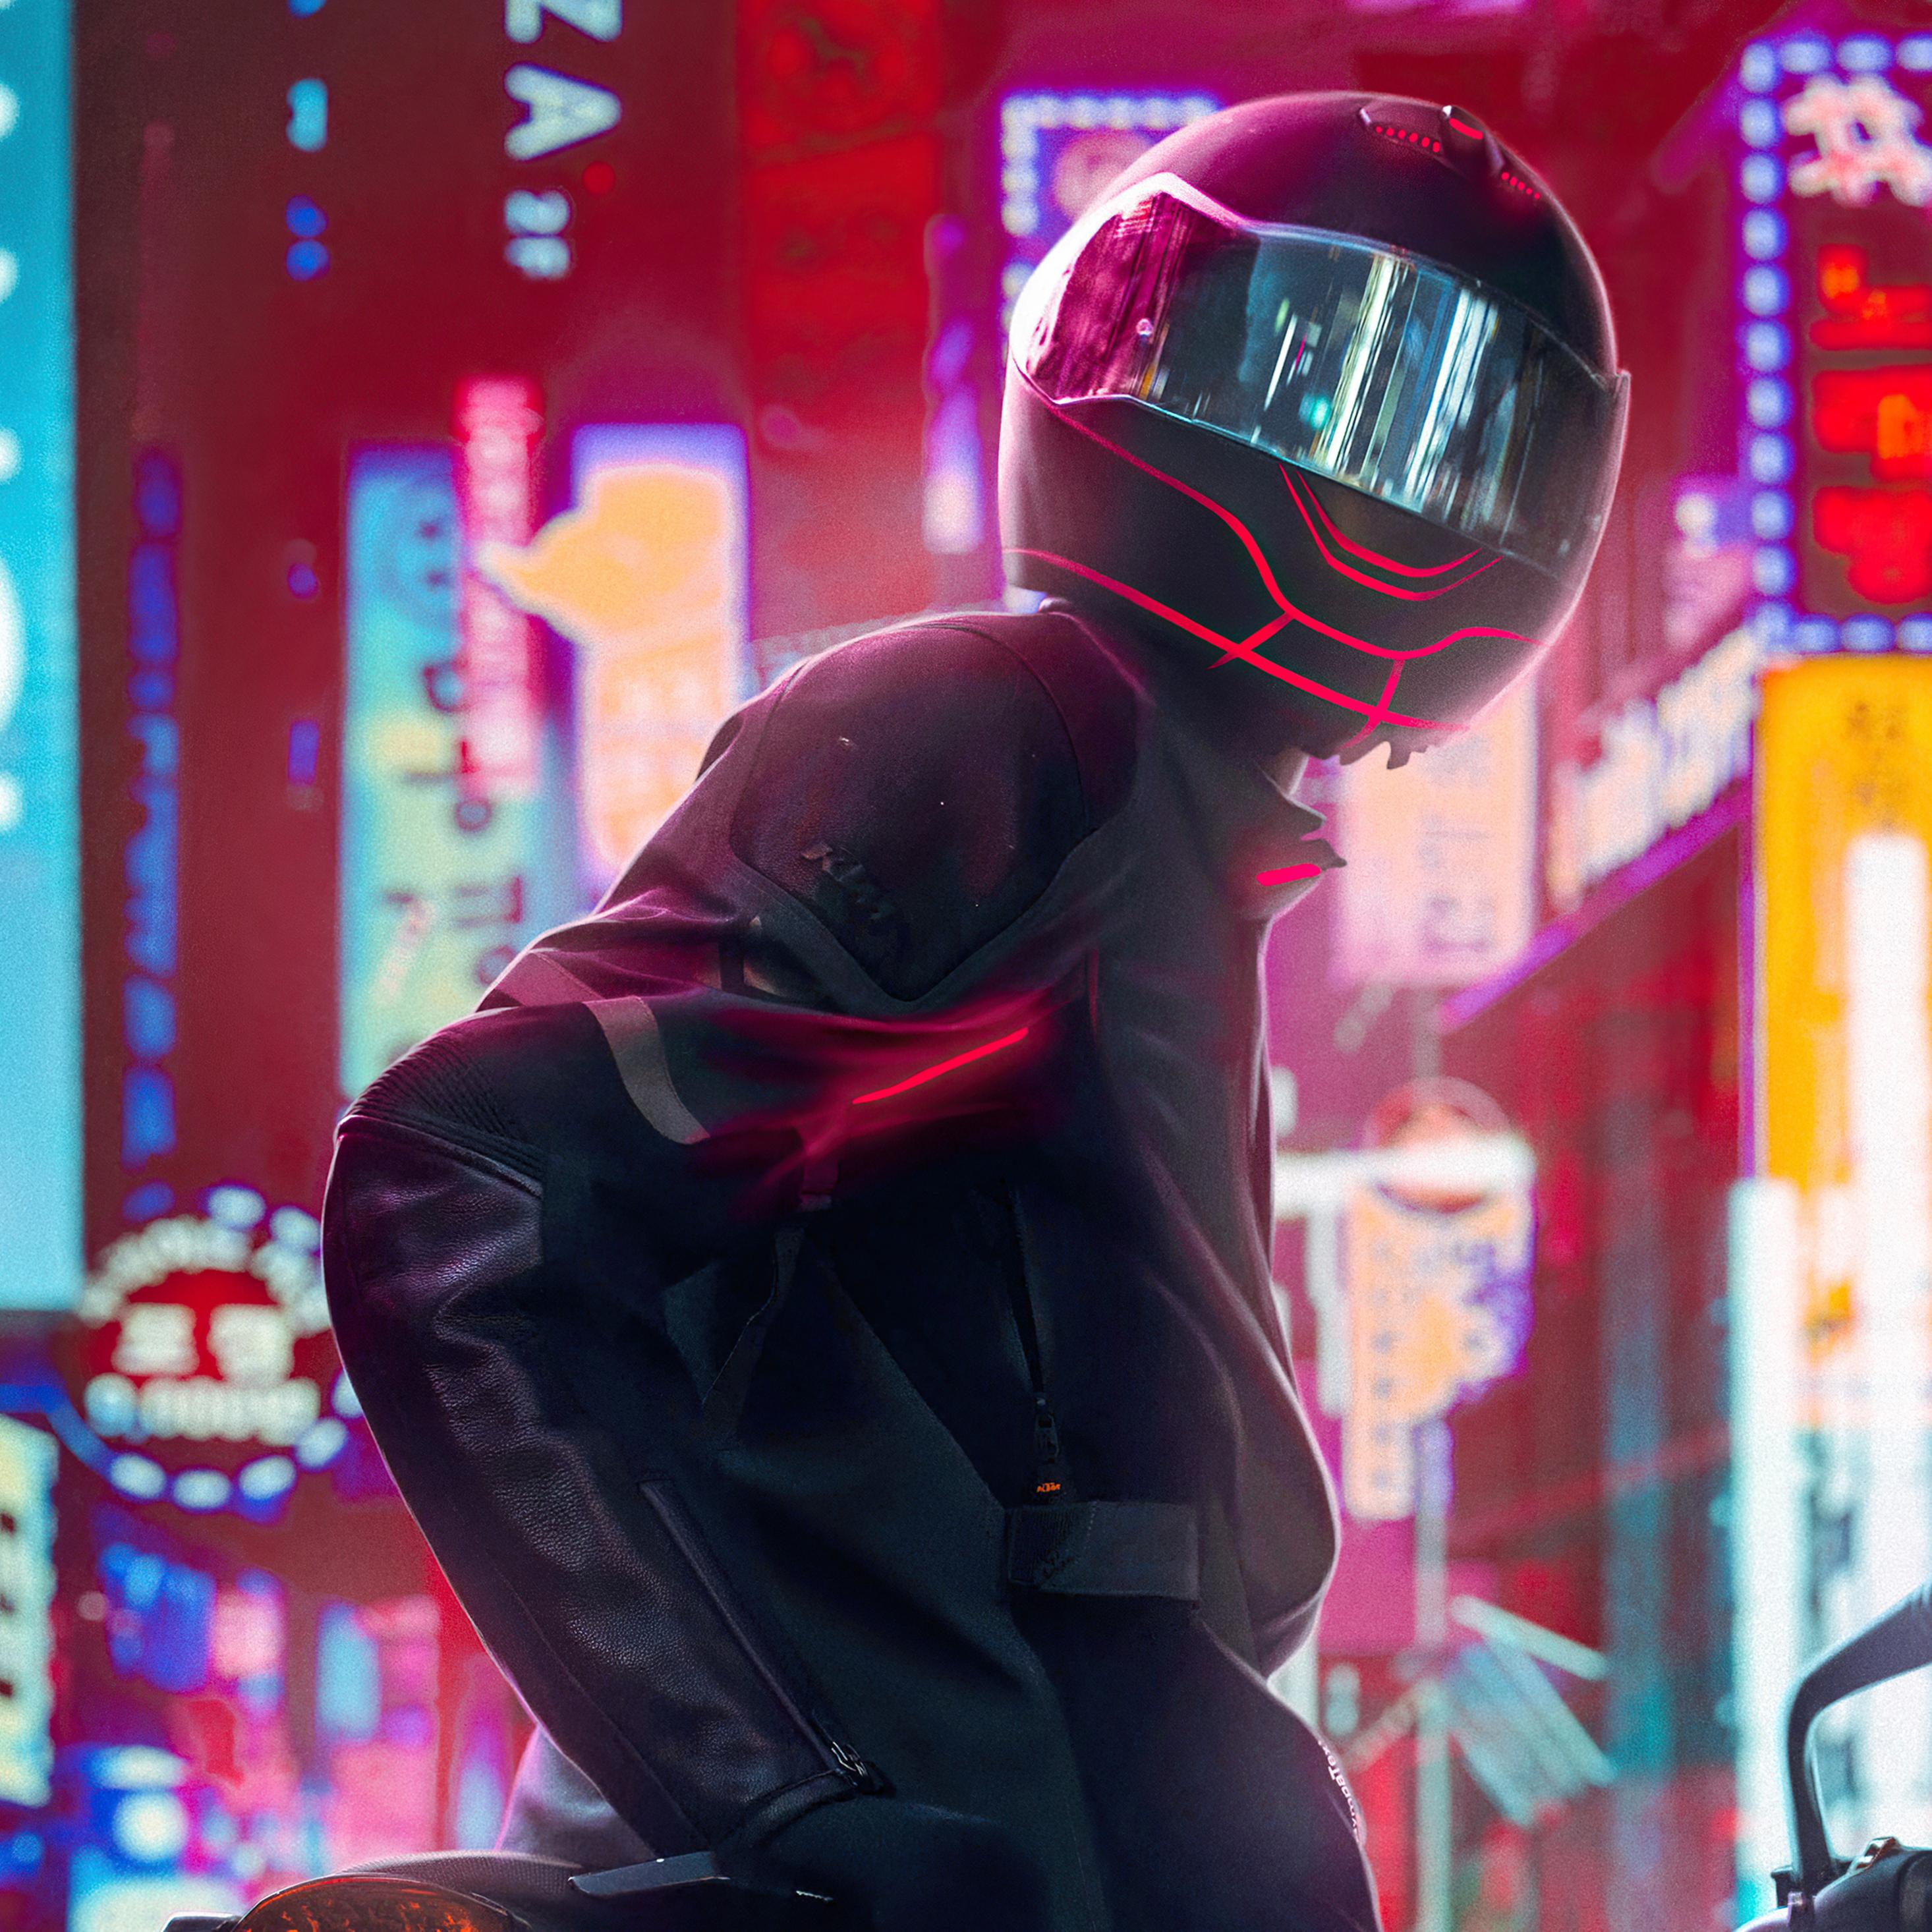 biker-city-colorful-4k-c4.jpg